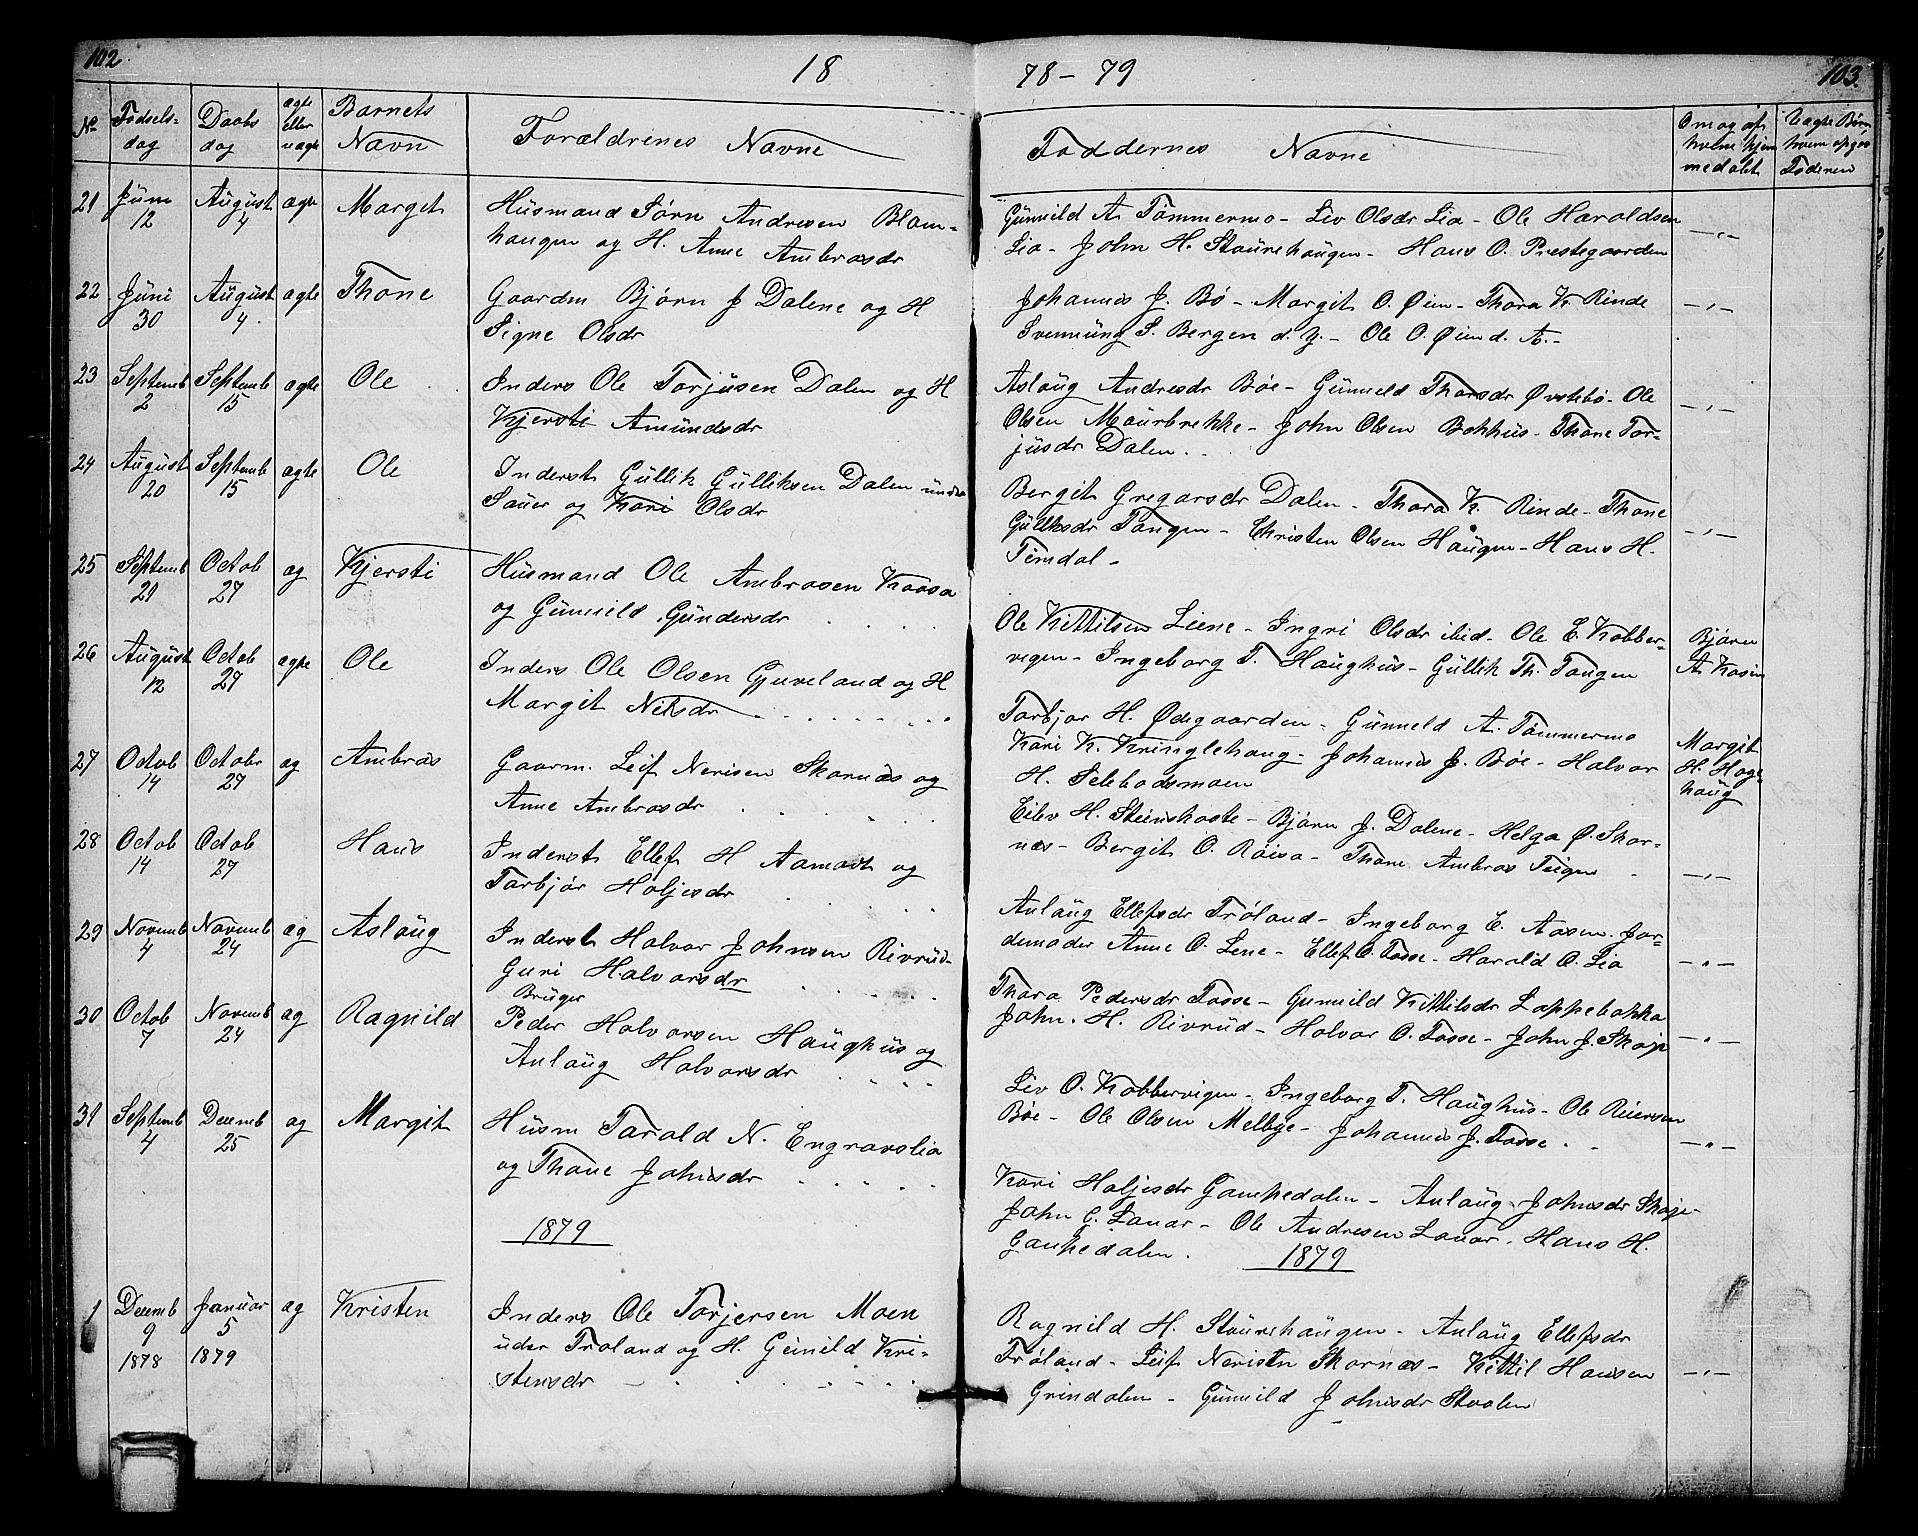 SAKO, Hjartdal kirkebøker, G/Gb/L0002: Klokkerbok nr. II 2, 1854-1884, s. 102-103